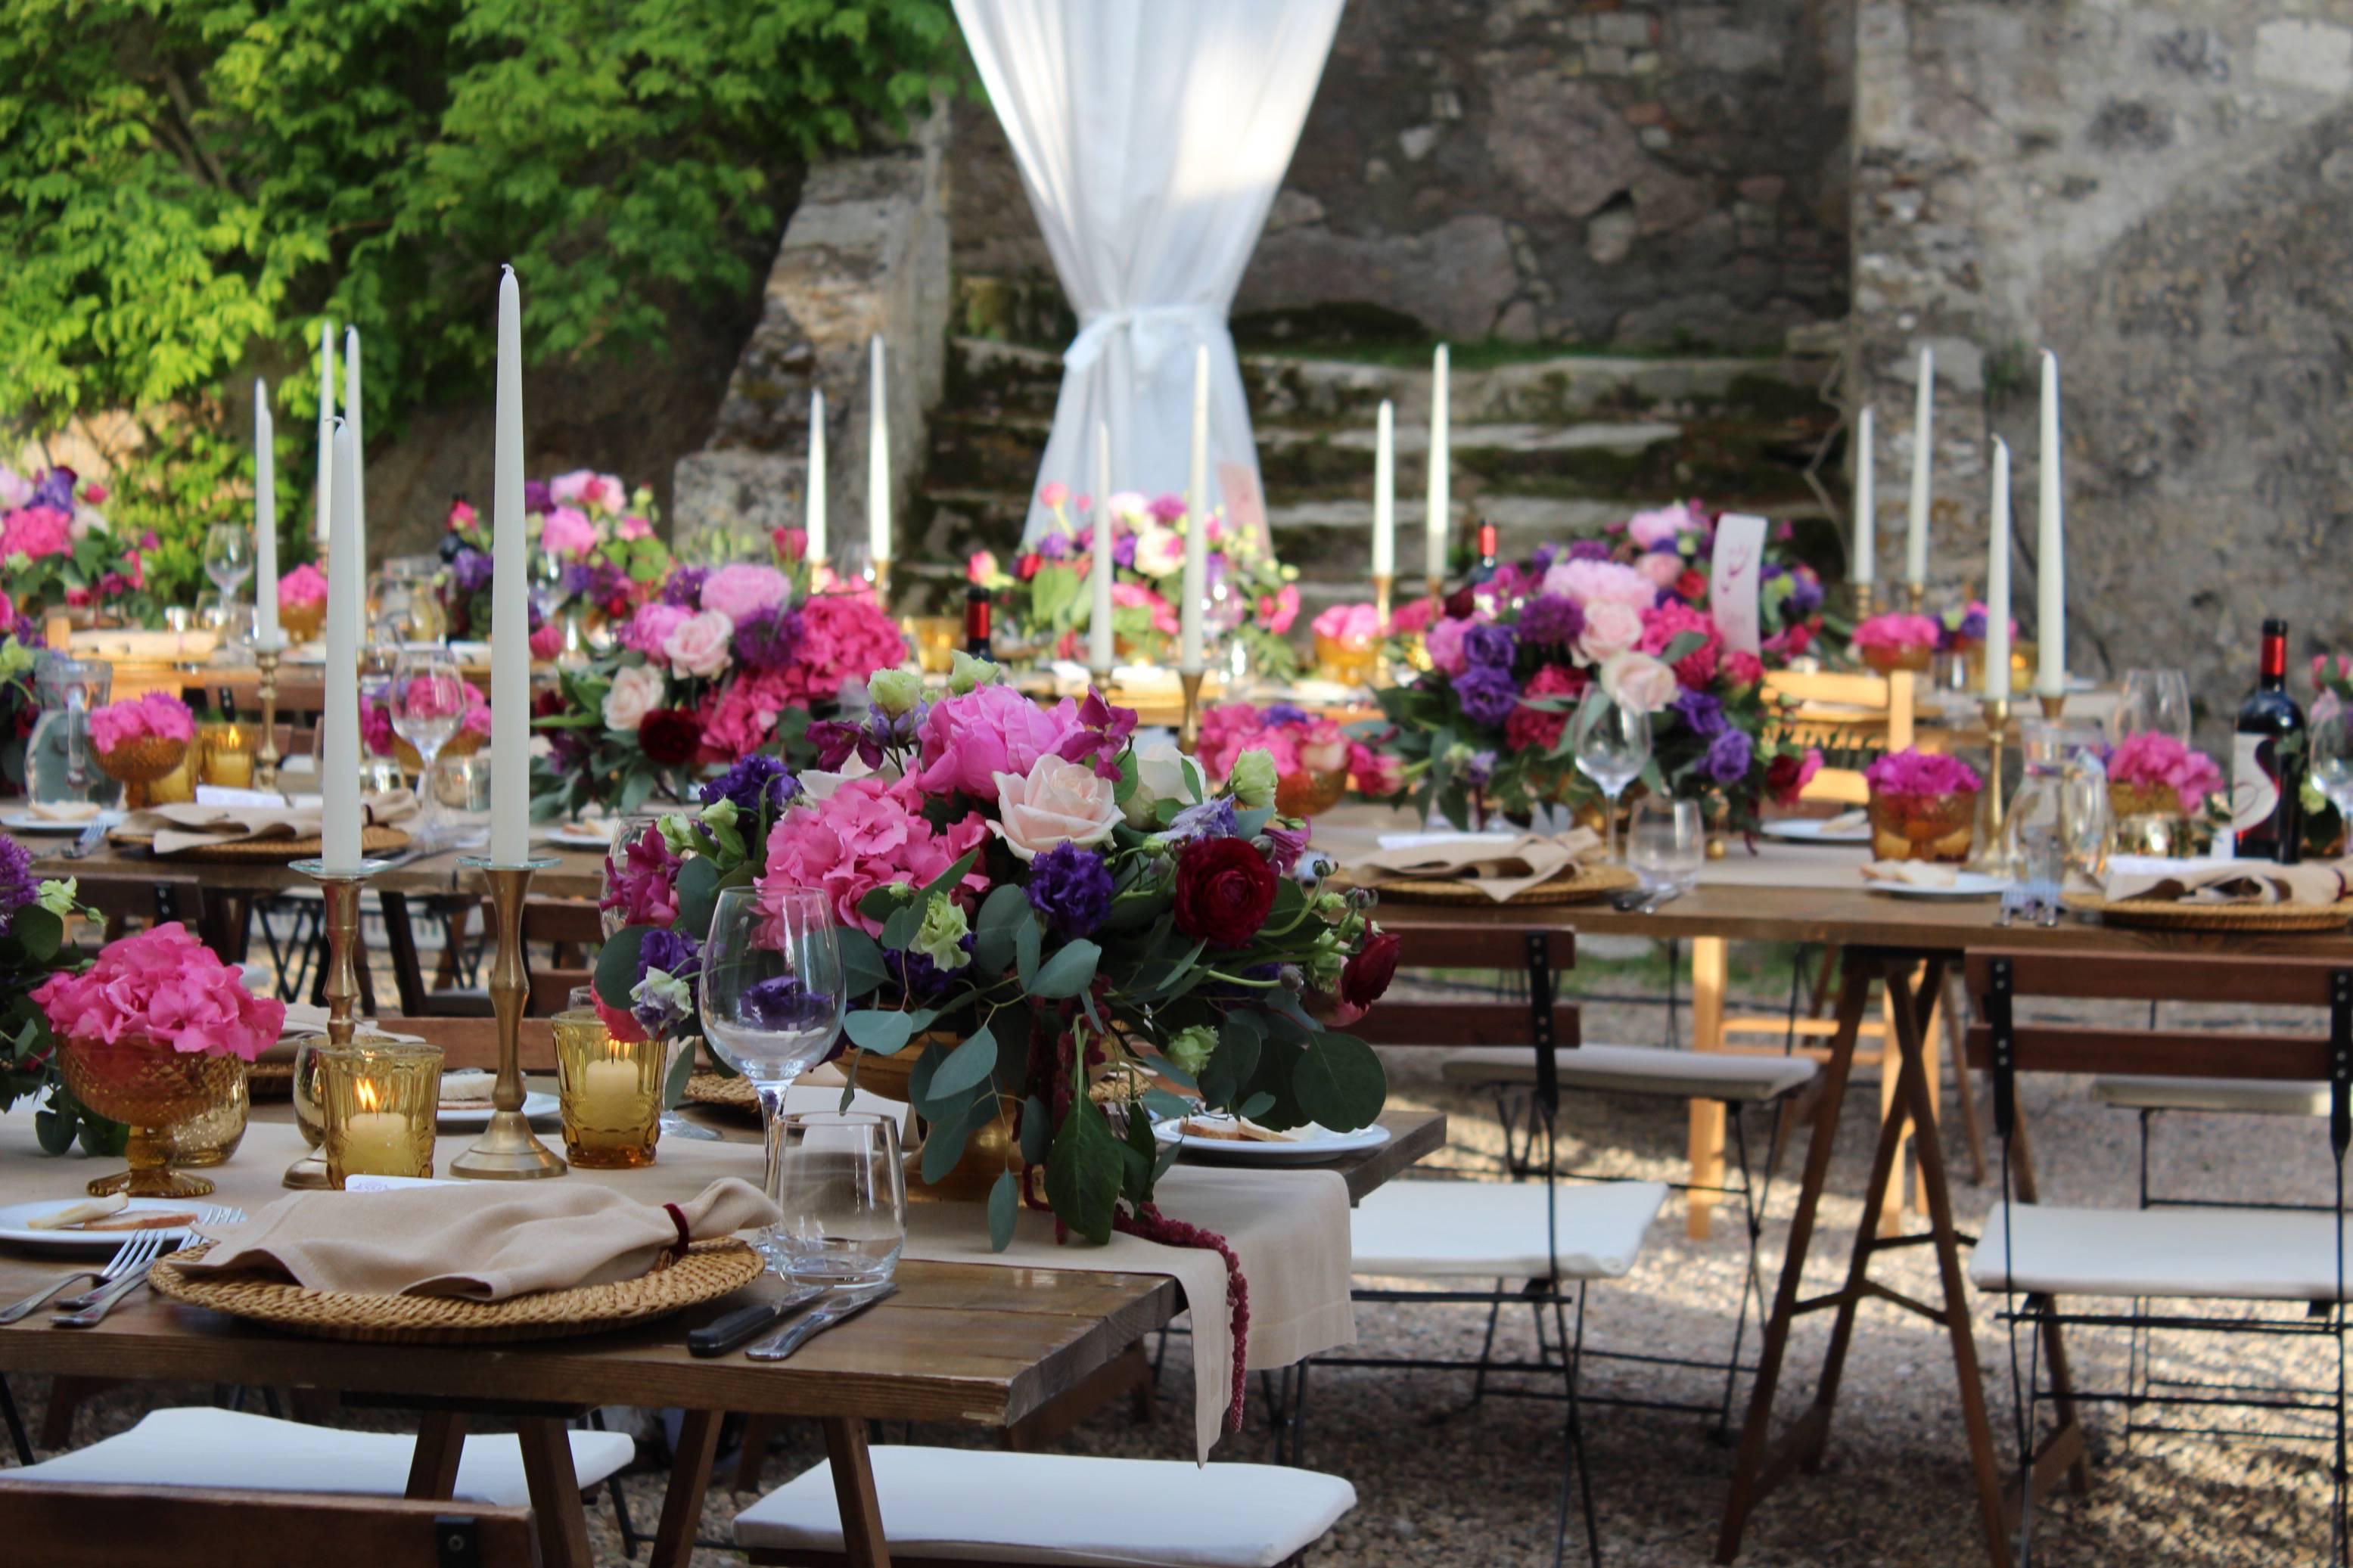 Matrimonio Nel Bosco Toscana : Matrimonio tra i borghi u be tuscan for a day